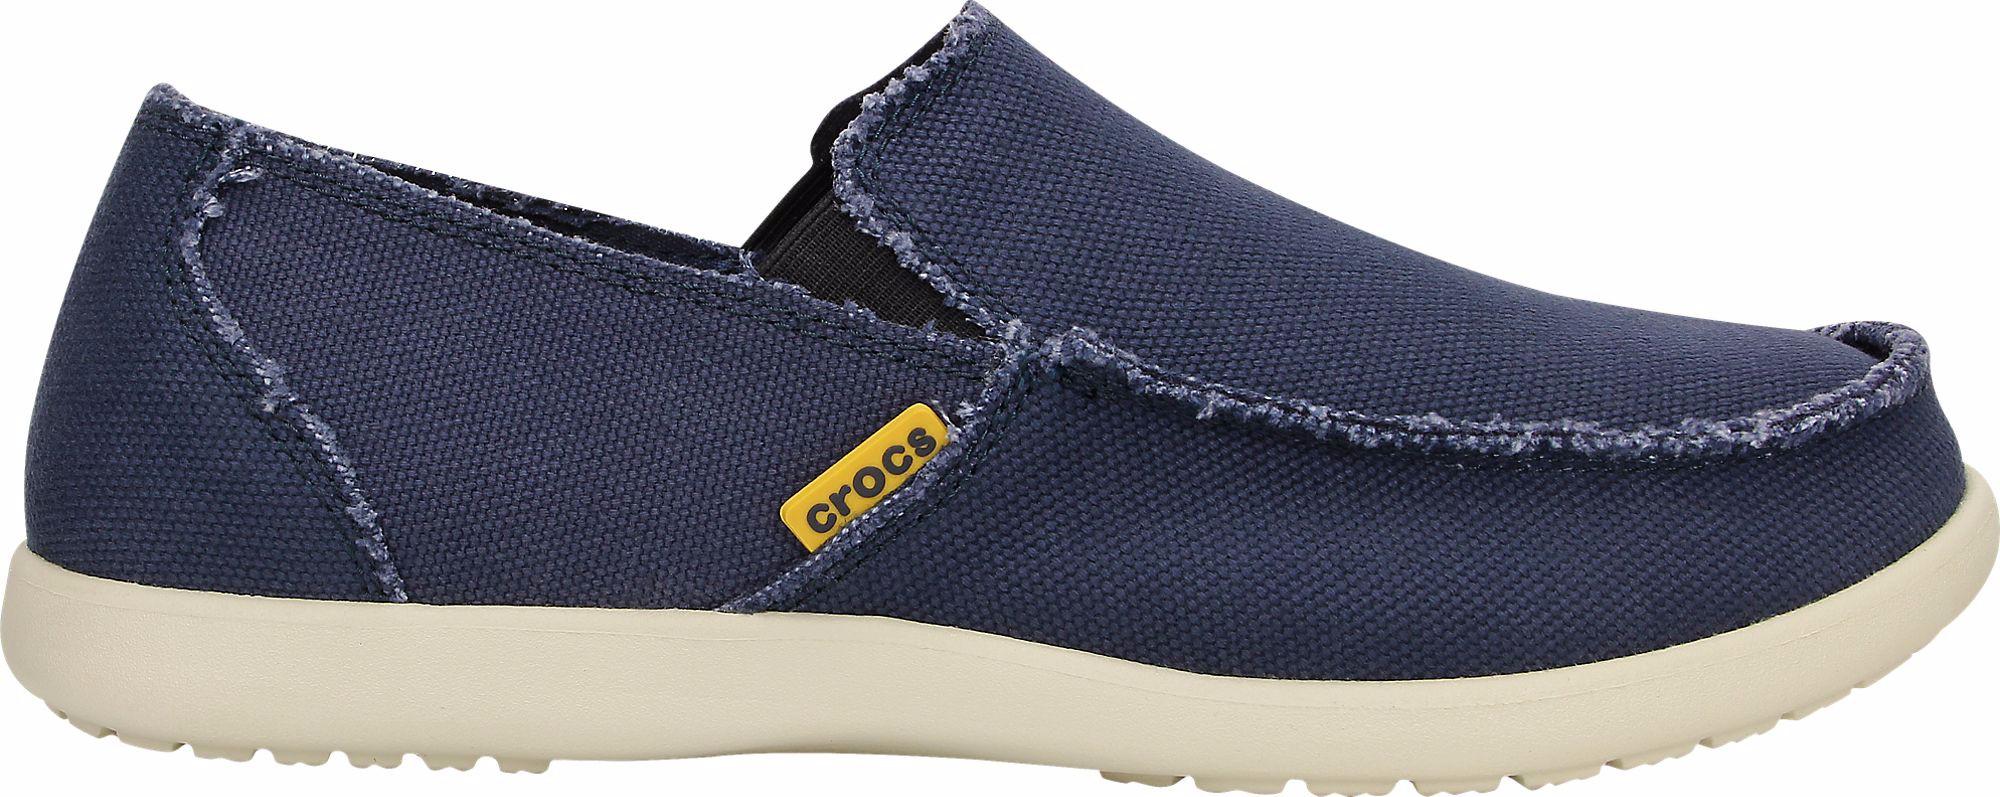 Crocs™ Santa Cruz Navy/Stucco 41